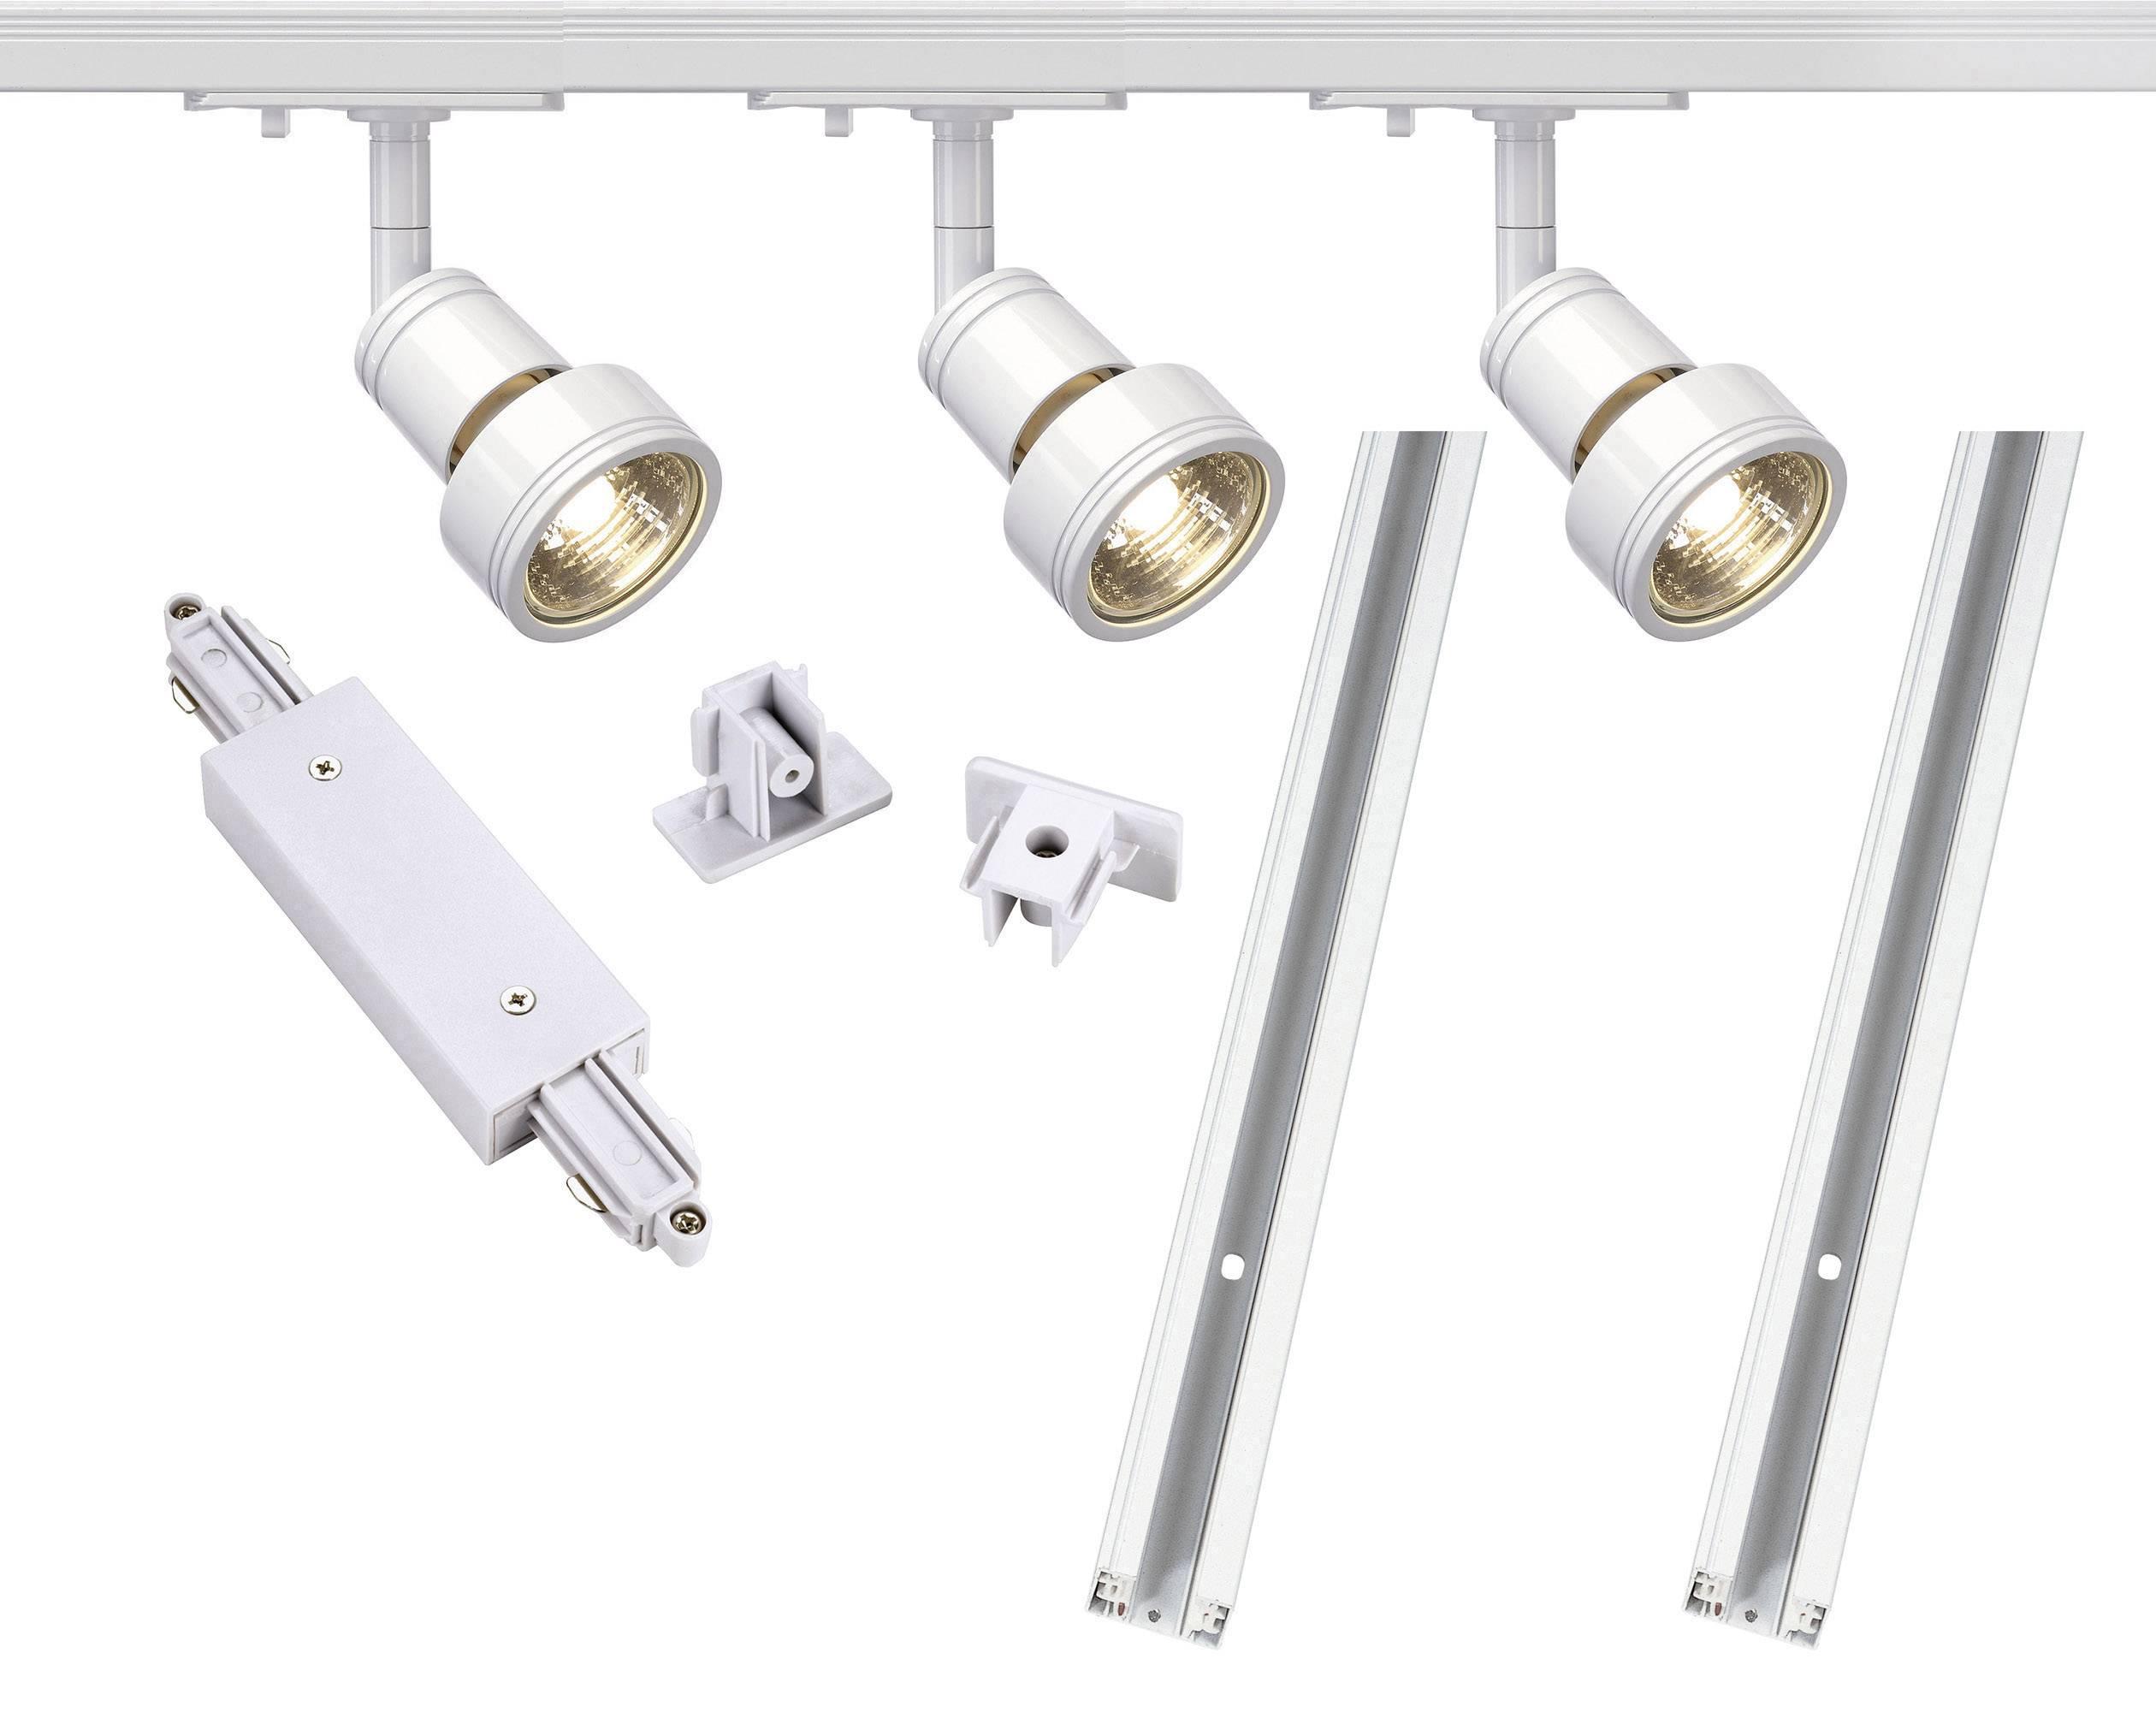 Lištový systém svítidel SLV, 1fázový, LED, 3x 50 W, GU10, bílá